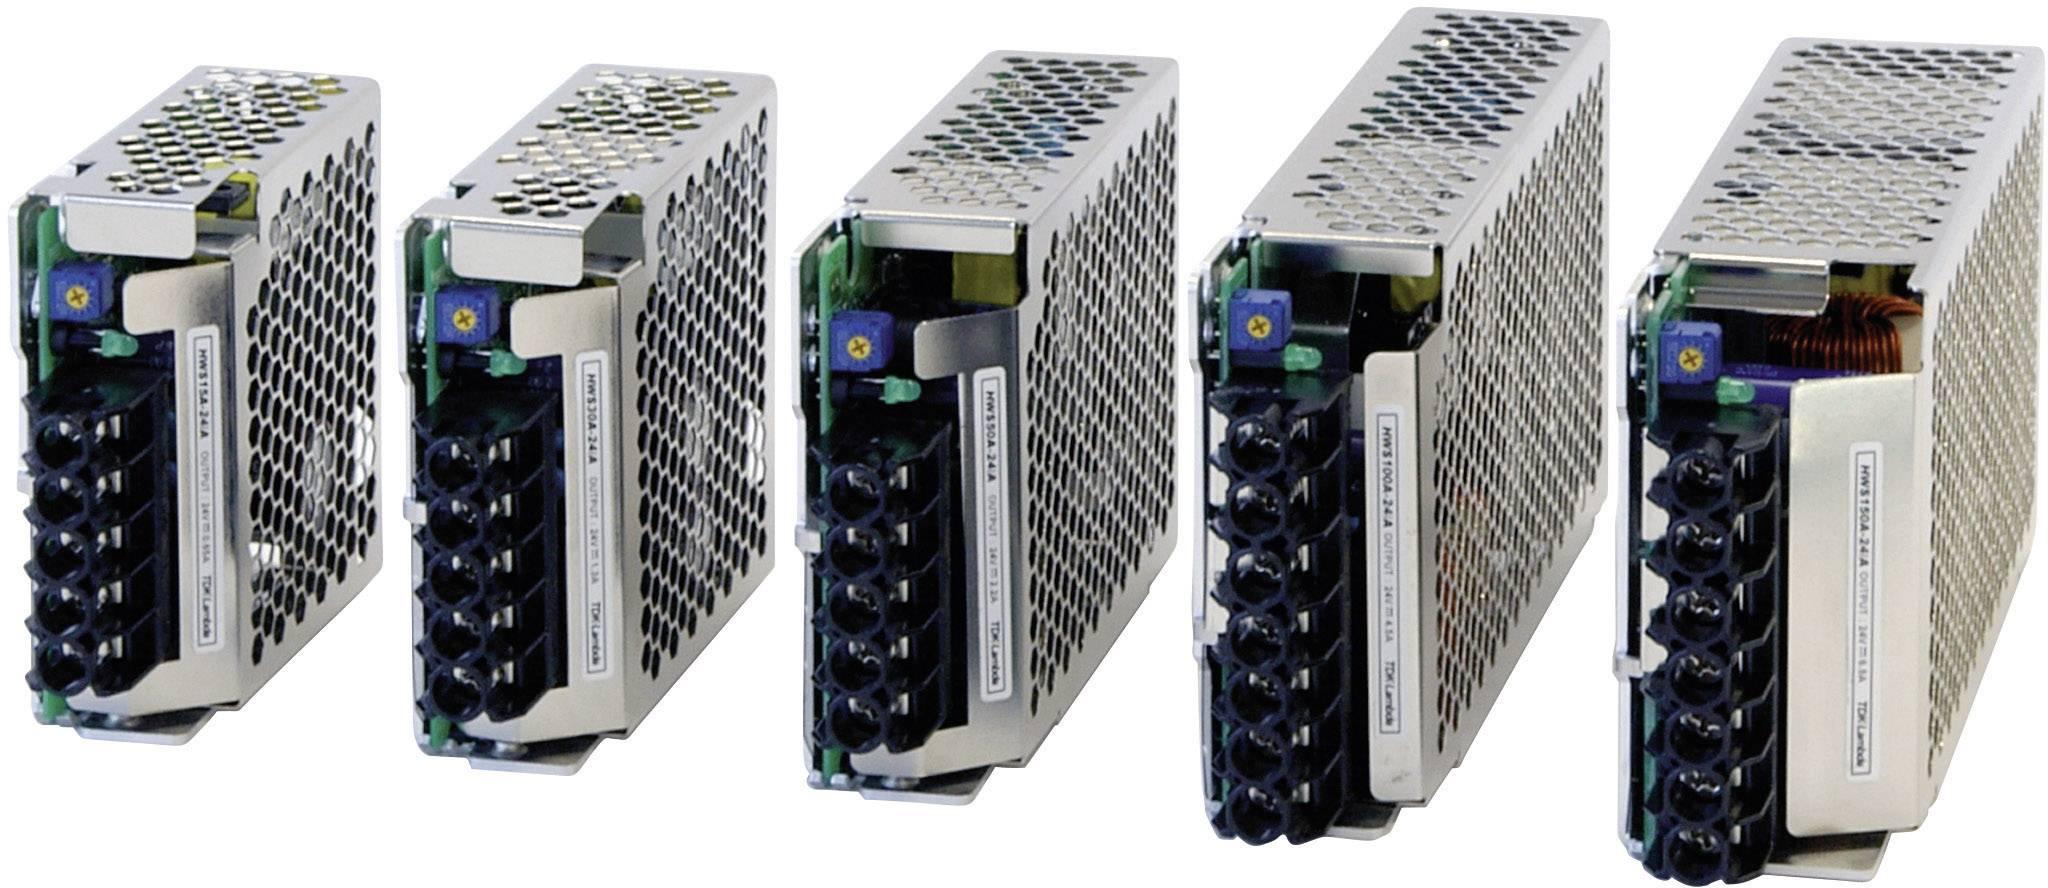 Zabudovateľný napájací zdroj TDK-Lambda HWS-100A-48, 48 V, 100,8 W